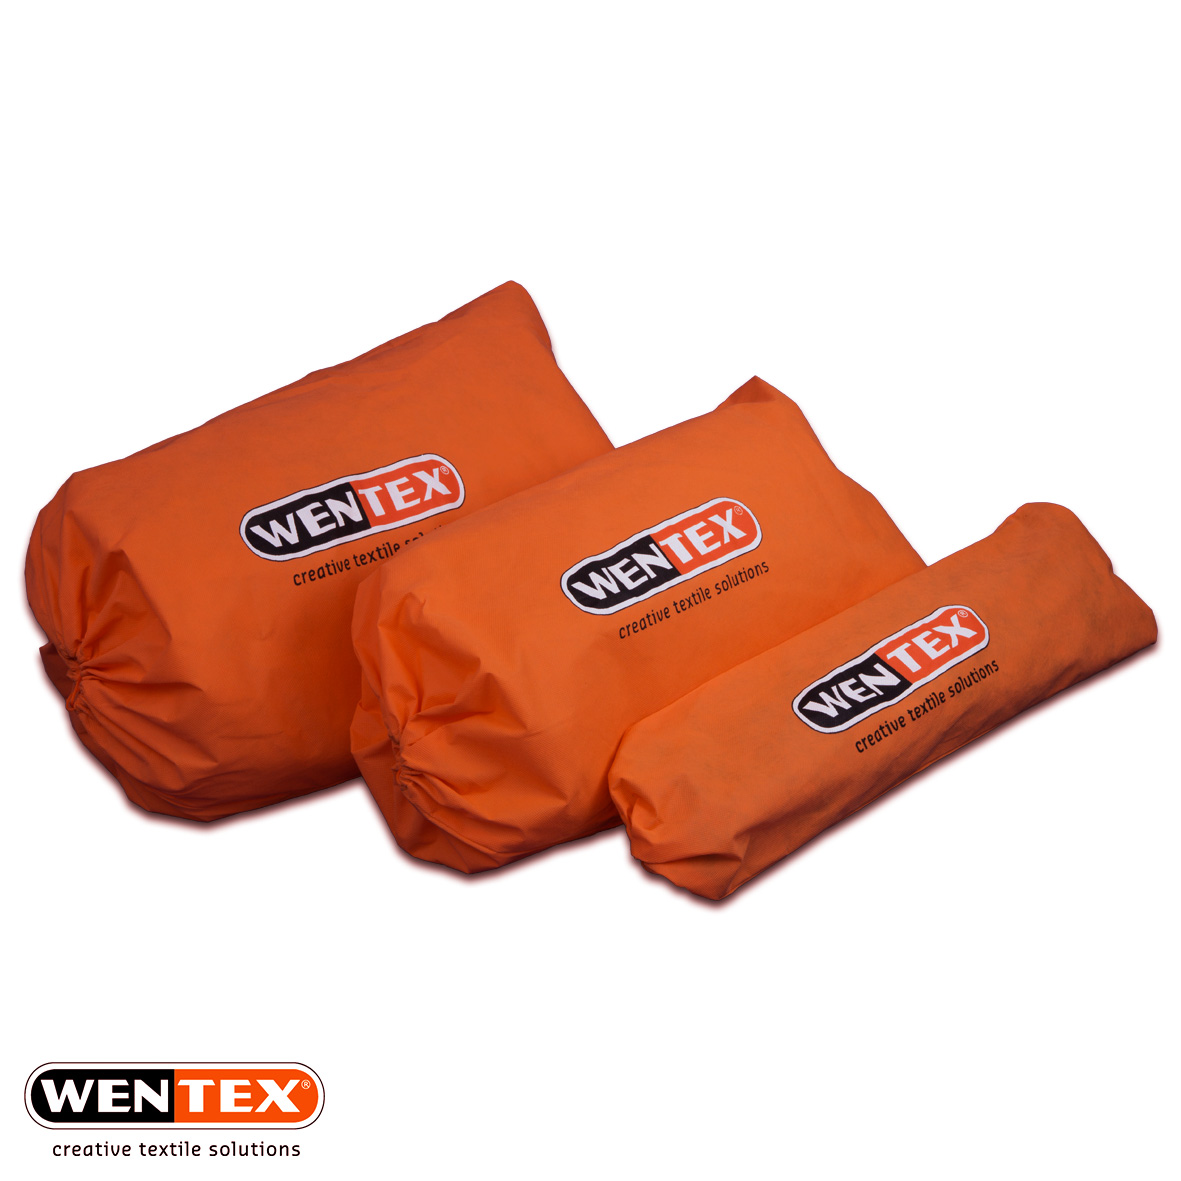 WENTEX® Bags Textile